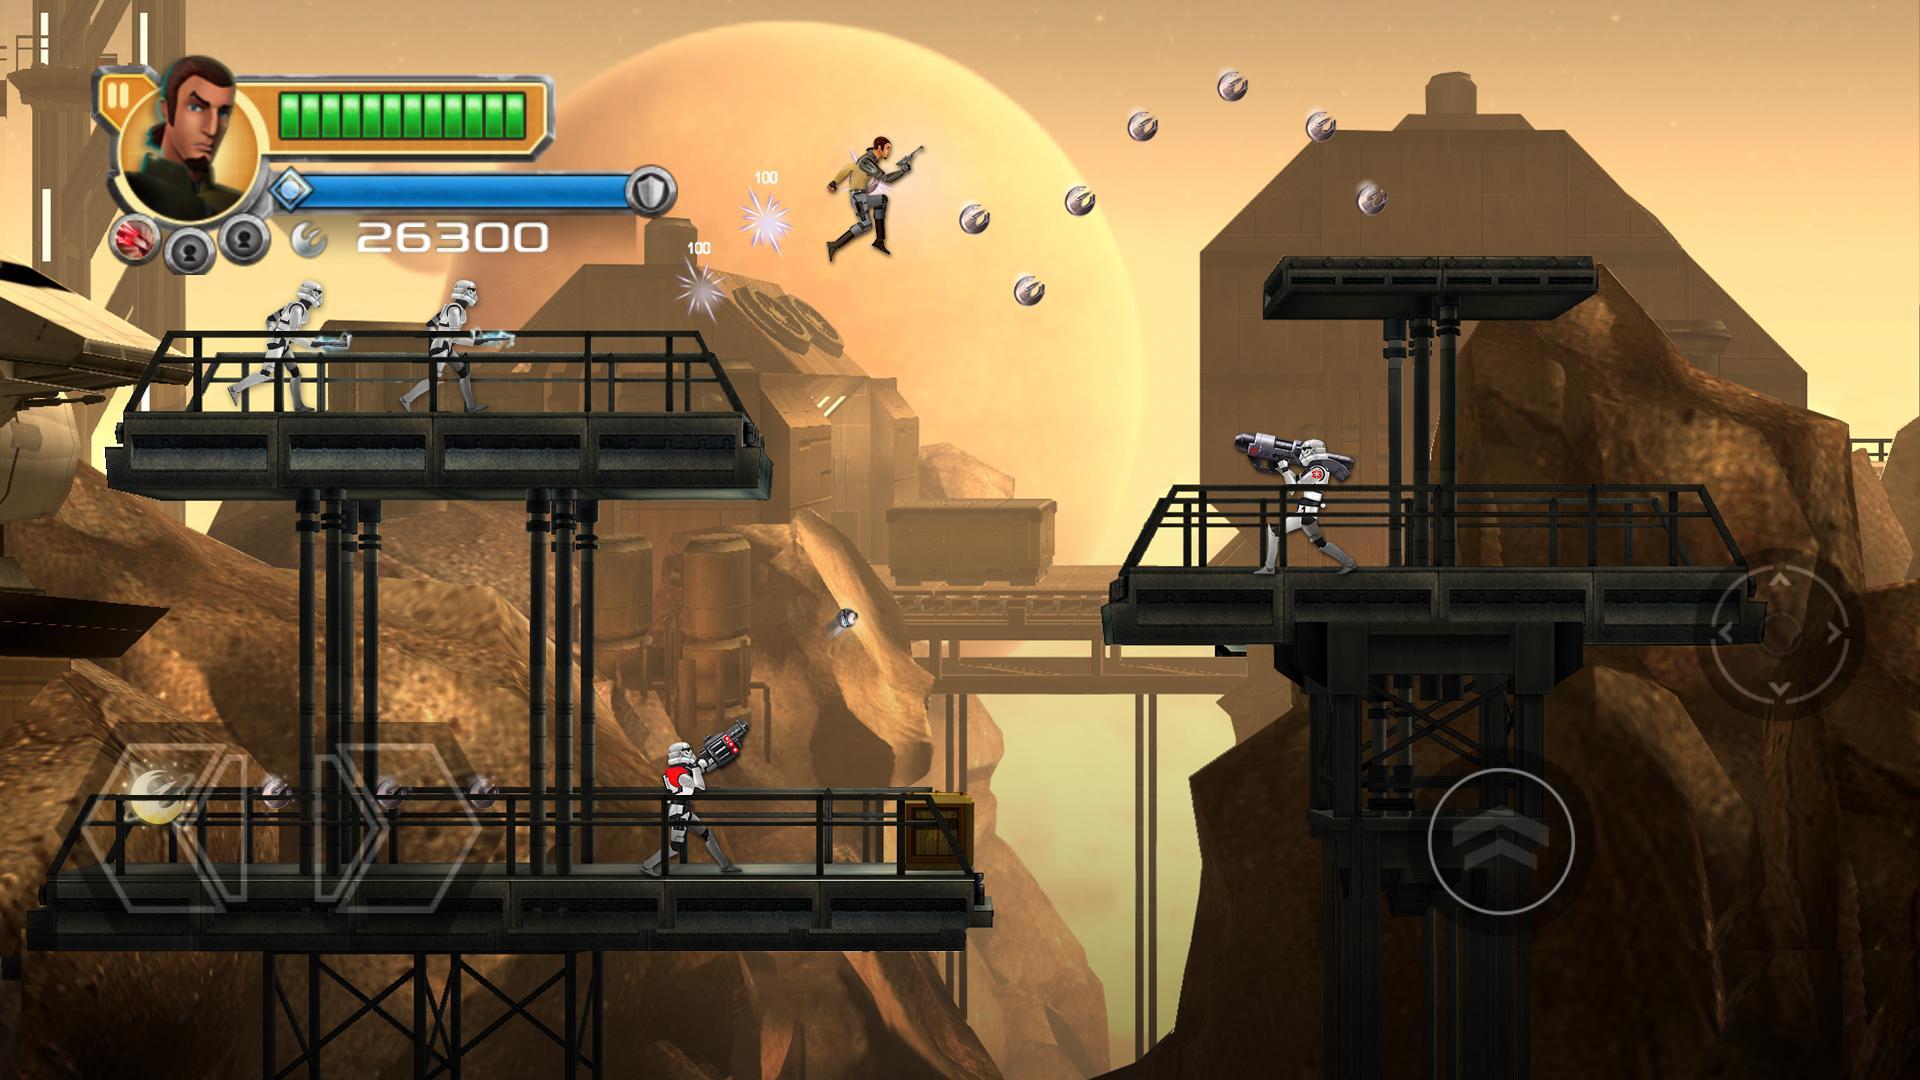 Star Wars Rebels: Missions screenshot #13